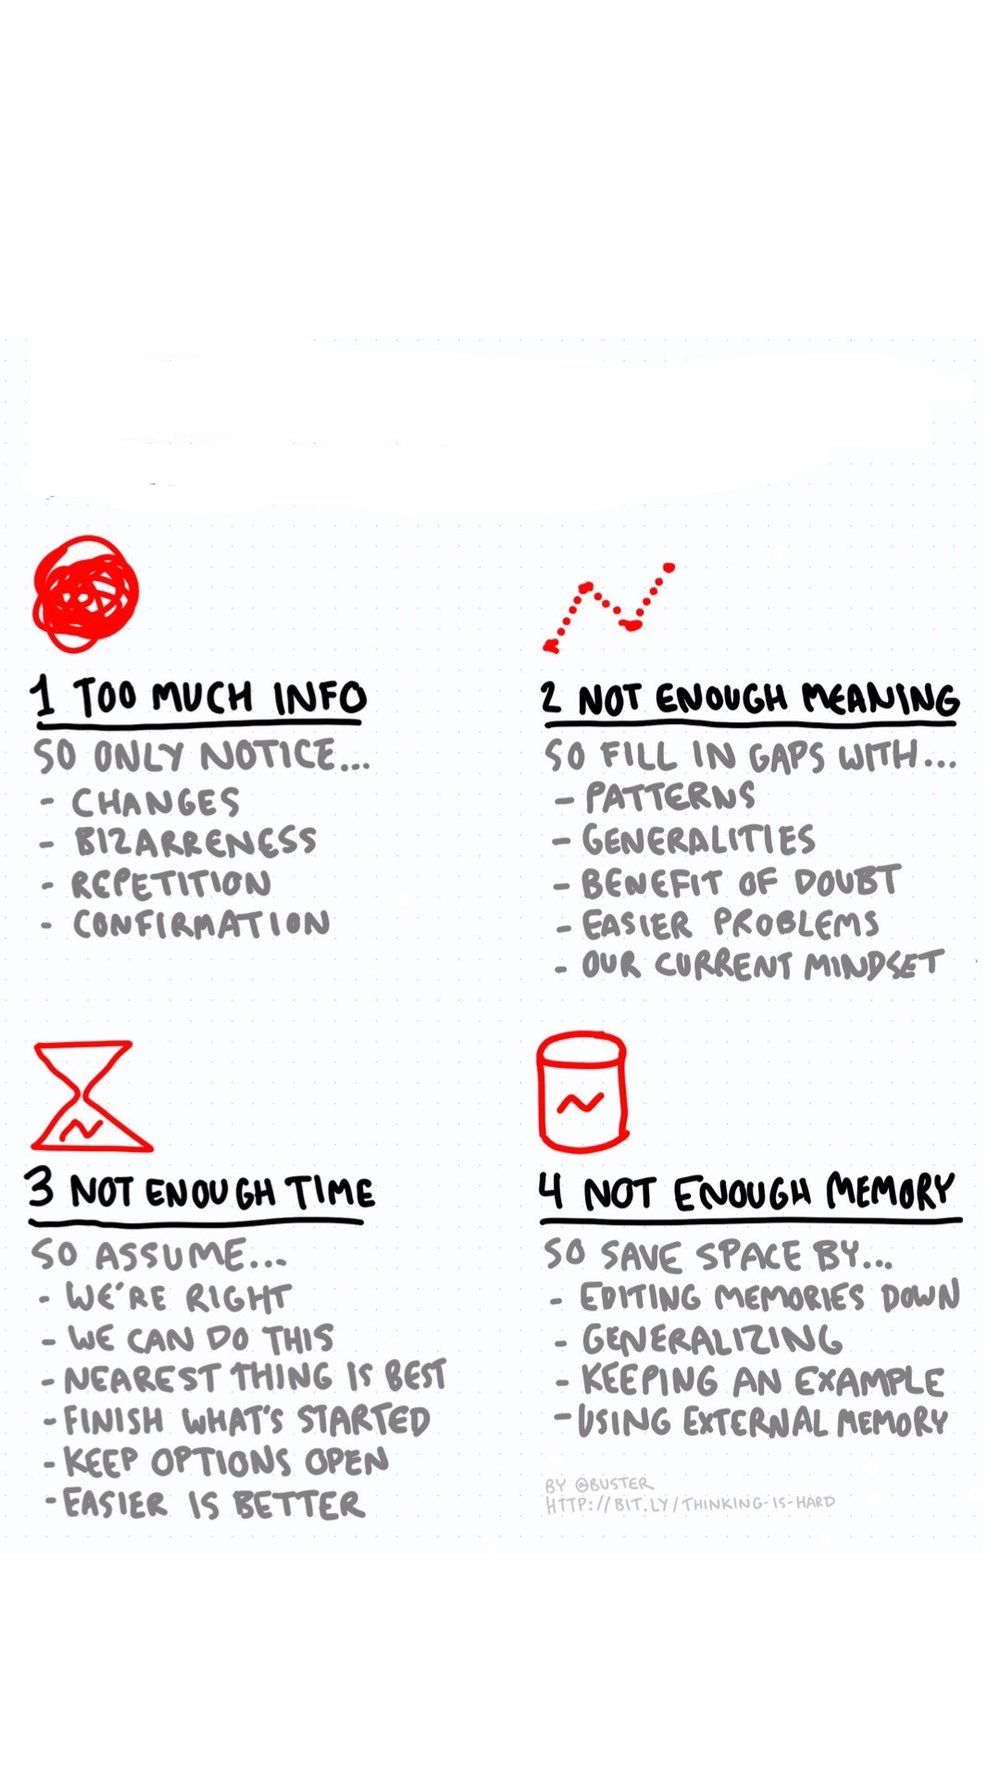 Source: Cognitive   bias cheat   sheet,   simplified